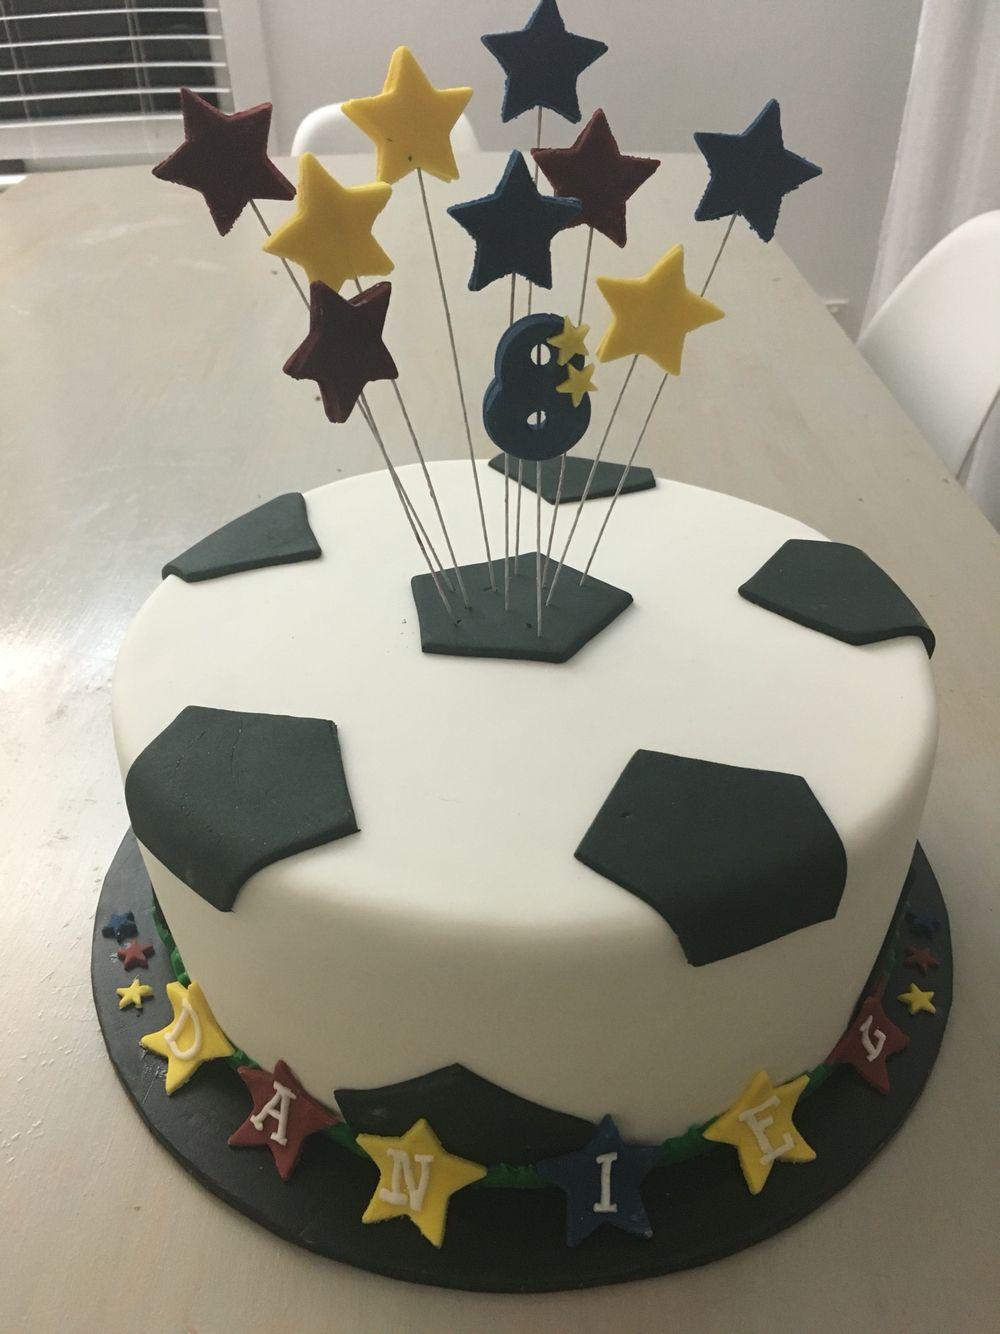 Simple Boys Soccer Football Cake In Fondant